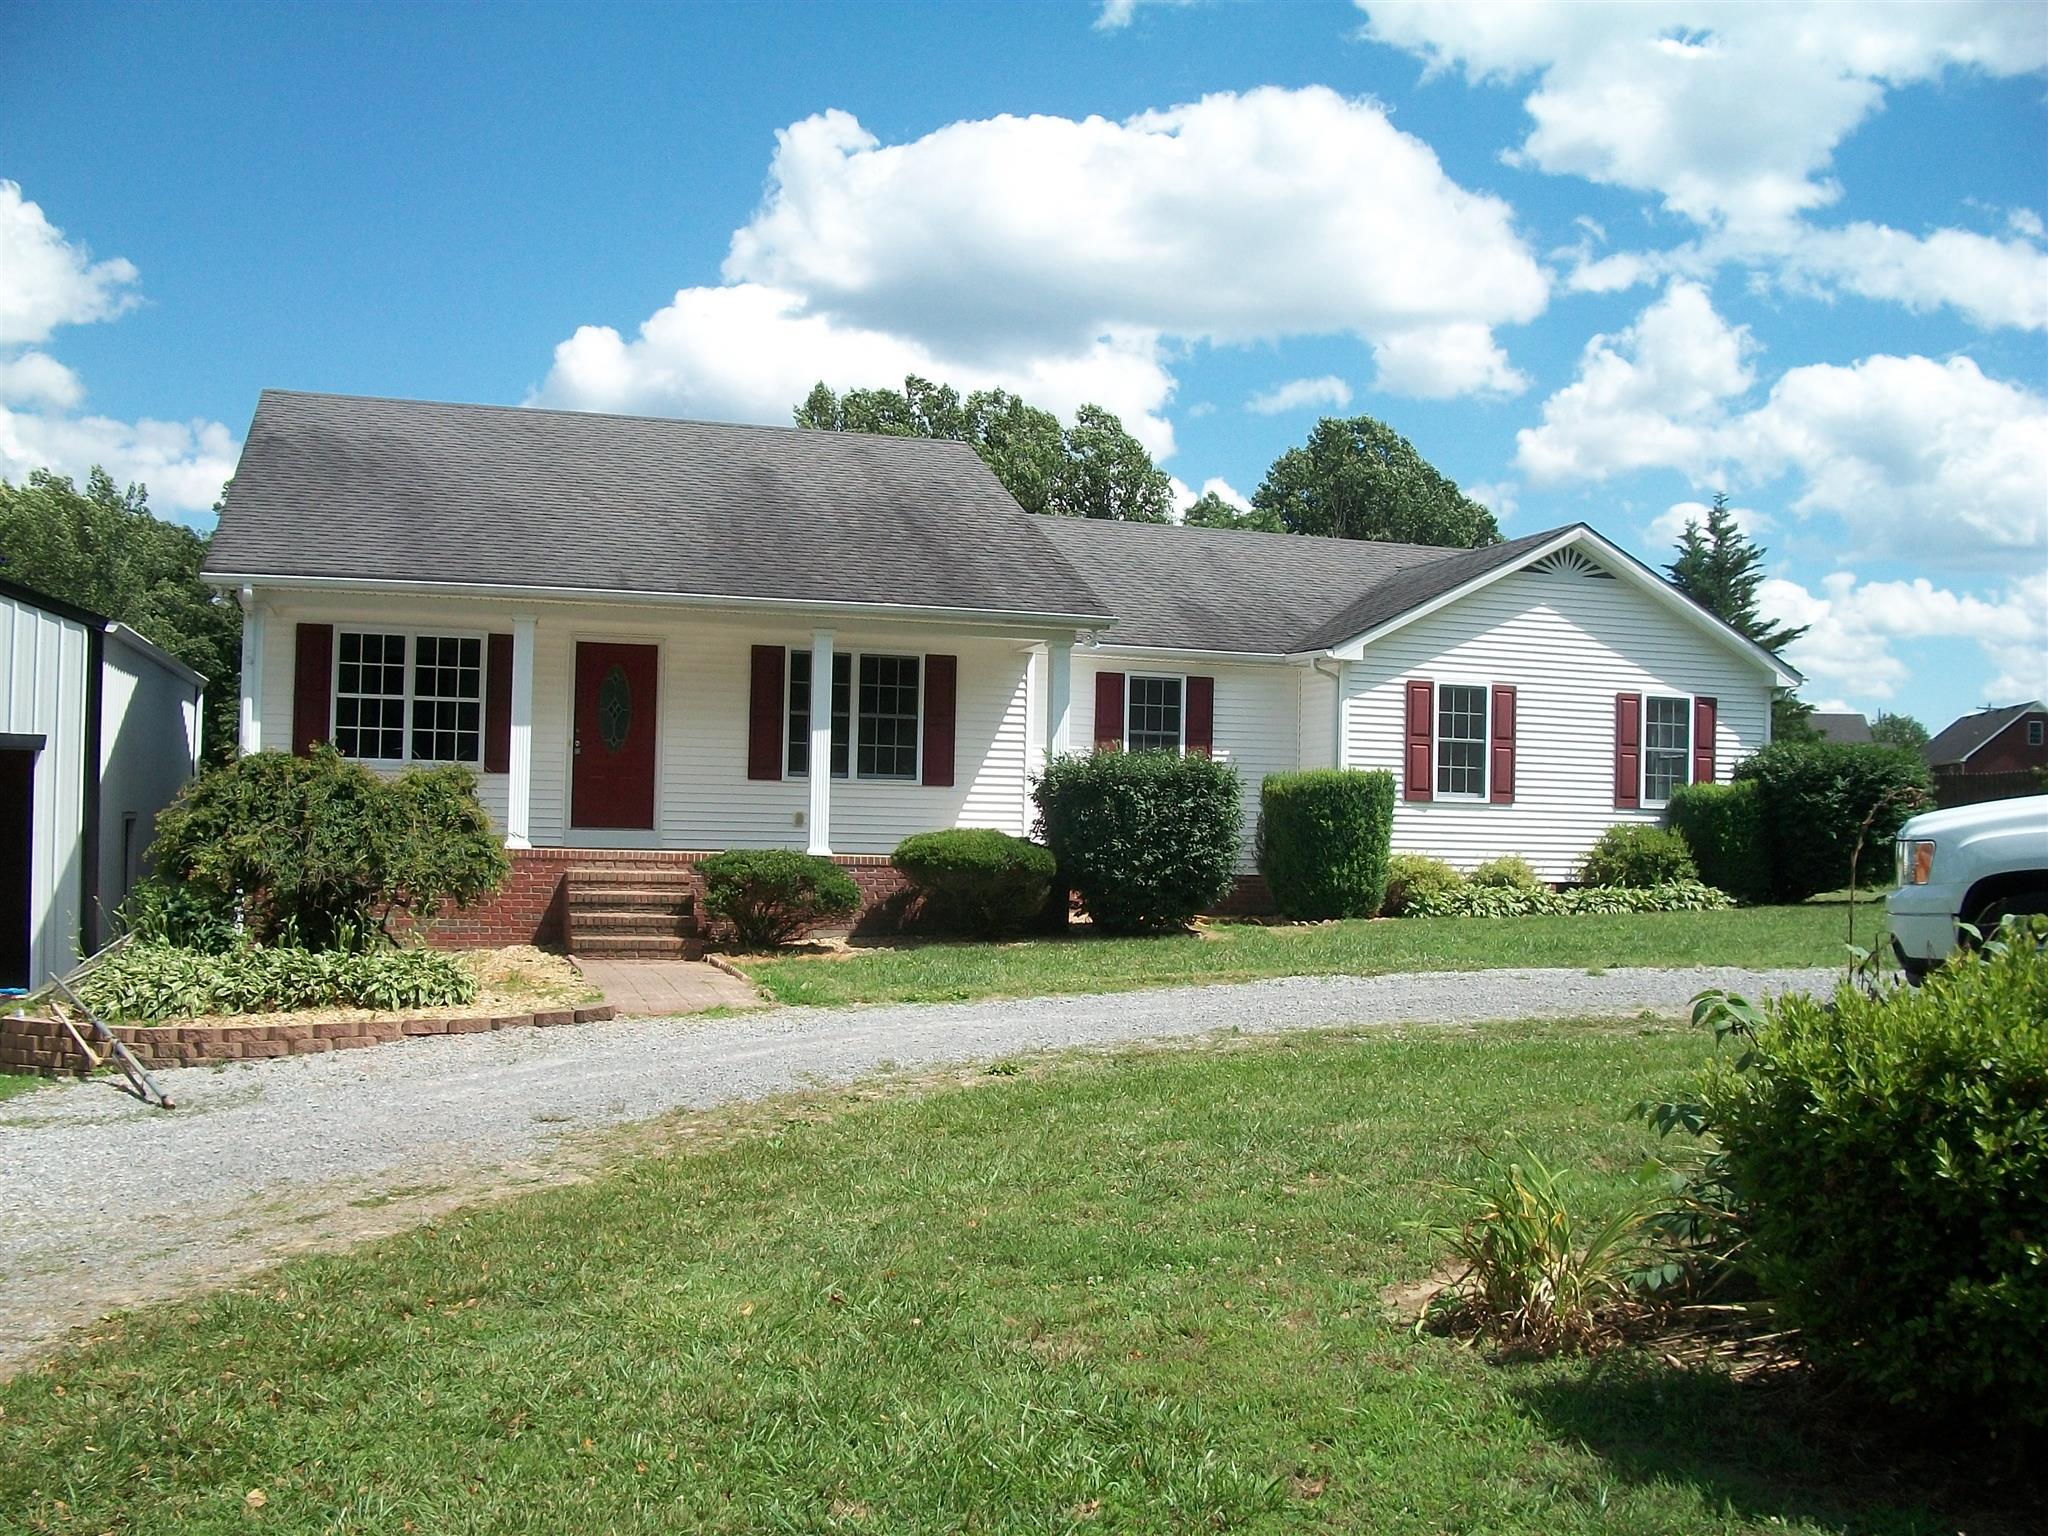 362 Deer Park Ln, Lafayette, TN 37083 - Lafayette, TN real estate listing